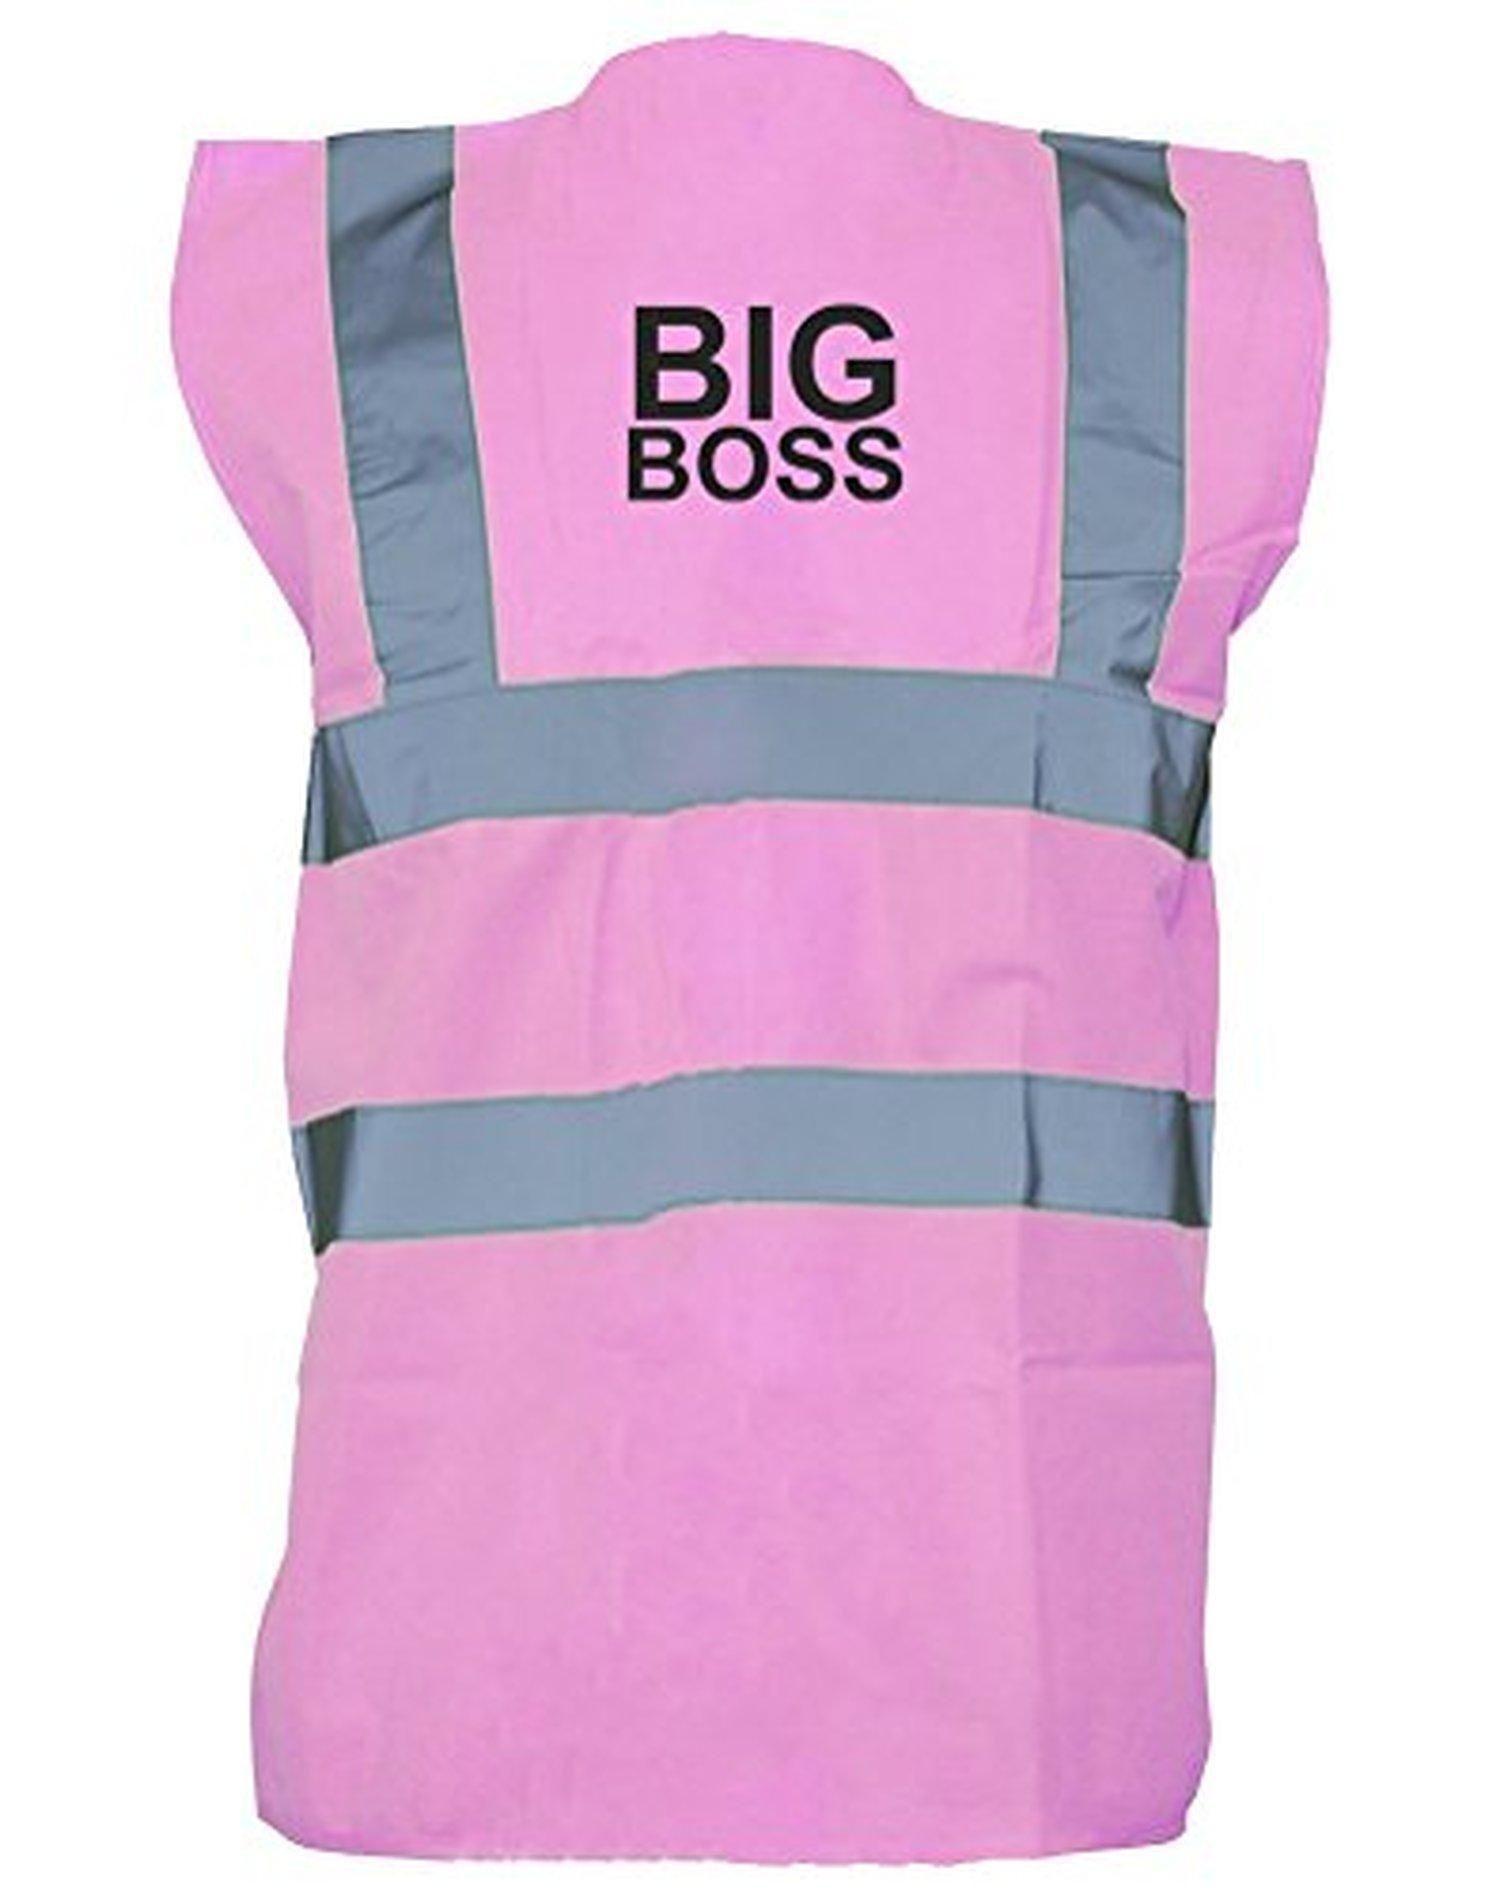 The Big Boss, Printed HiVis Vest Waistcoat Pink/Black L